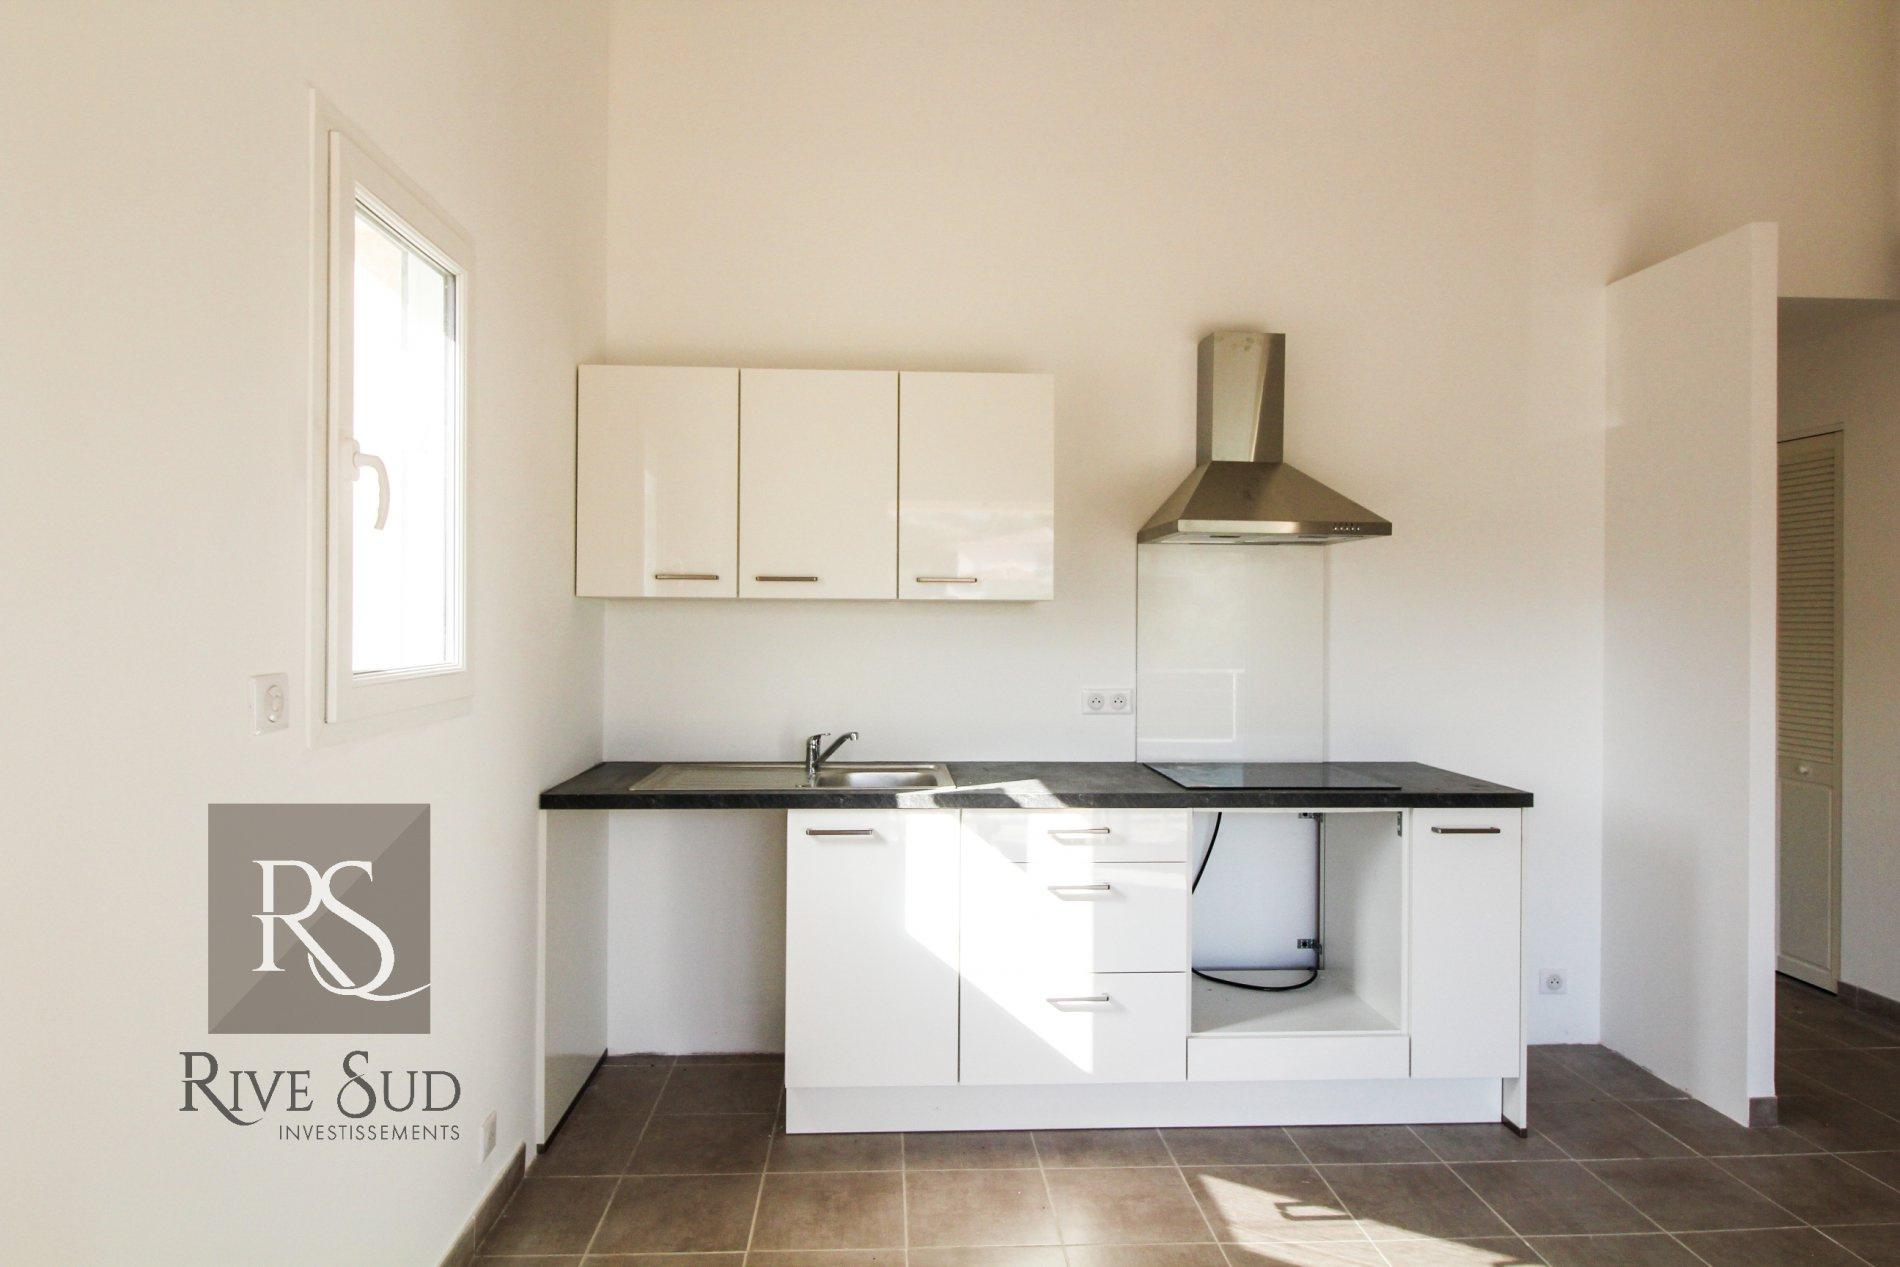 Vente appartement T3 Porticcio immobilier sejour 2